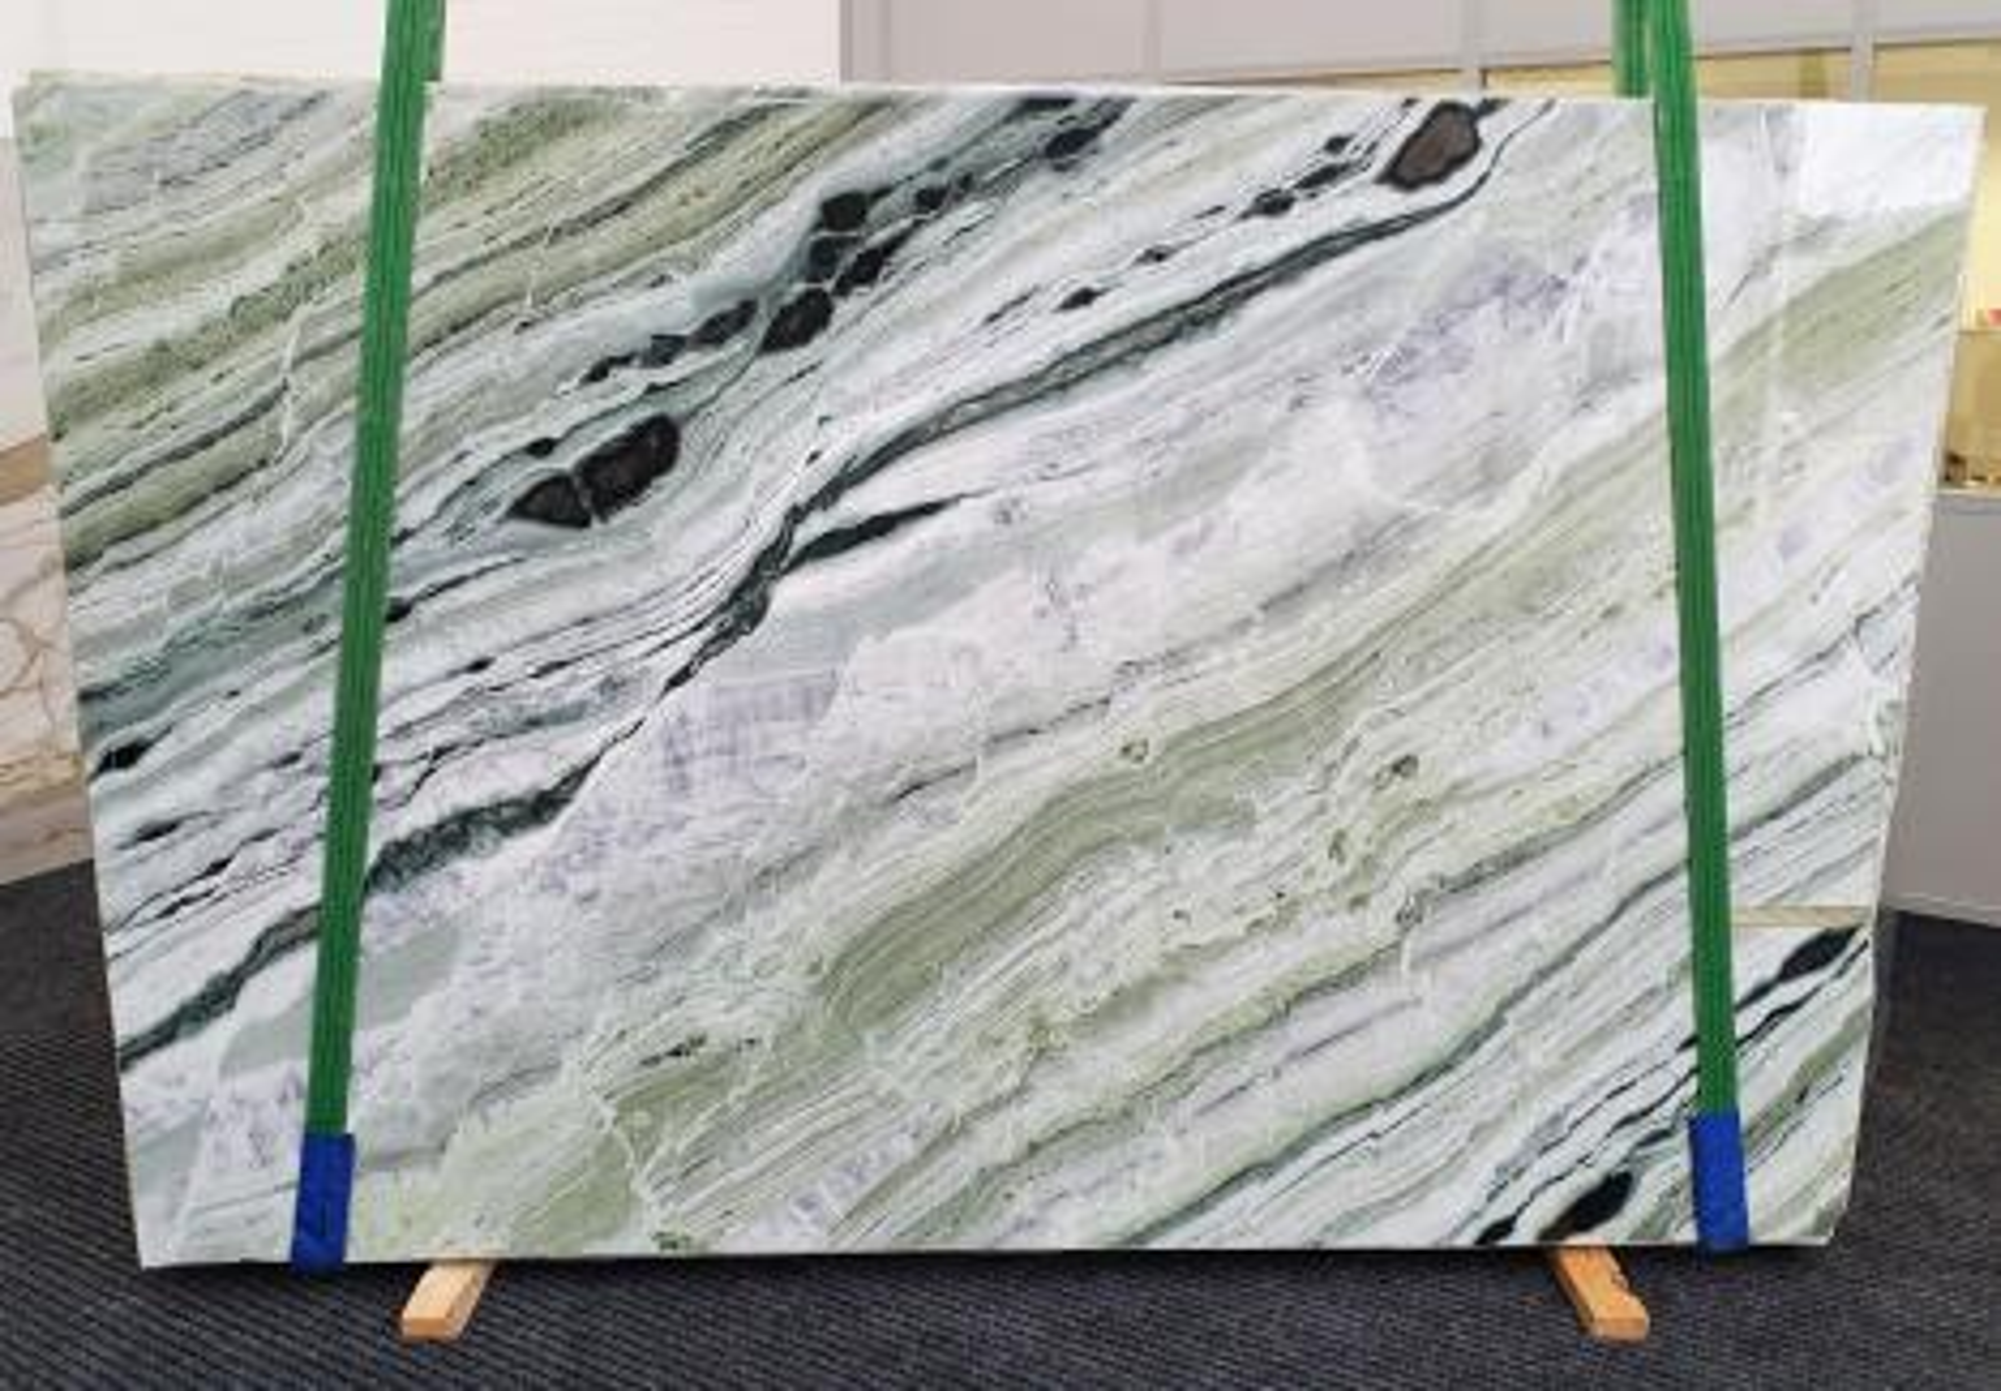 GREEN BEAUTY Supply Veneto (Italy) polished slabs 1452 , Slab #30 natural marble